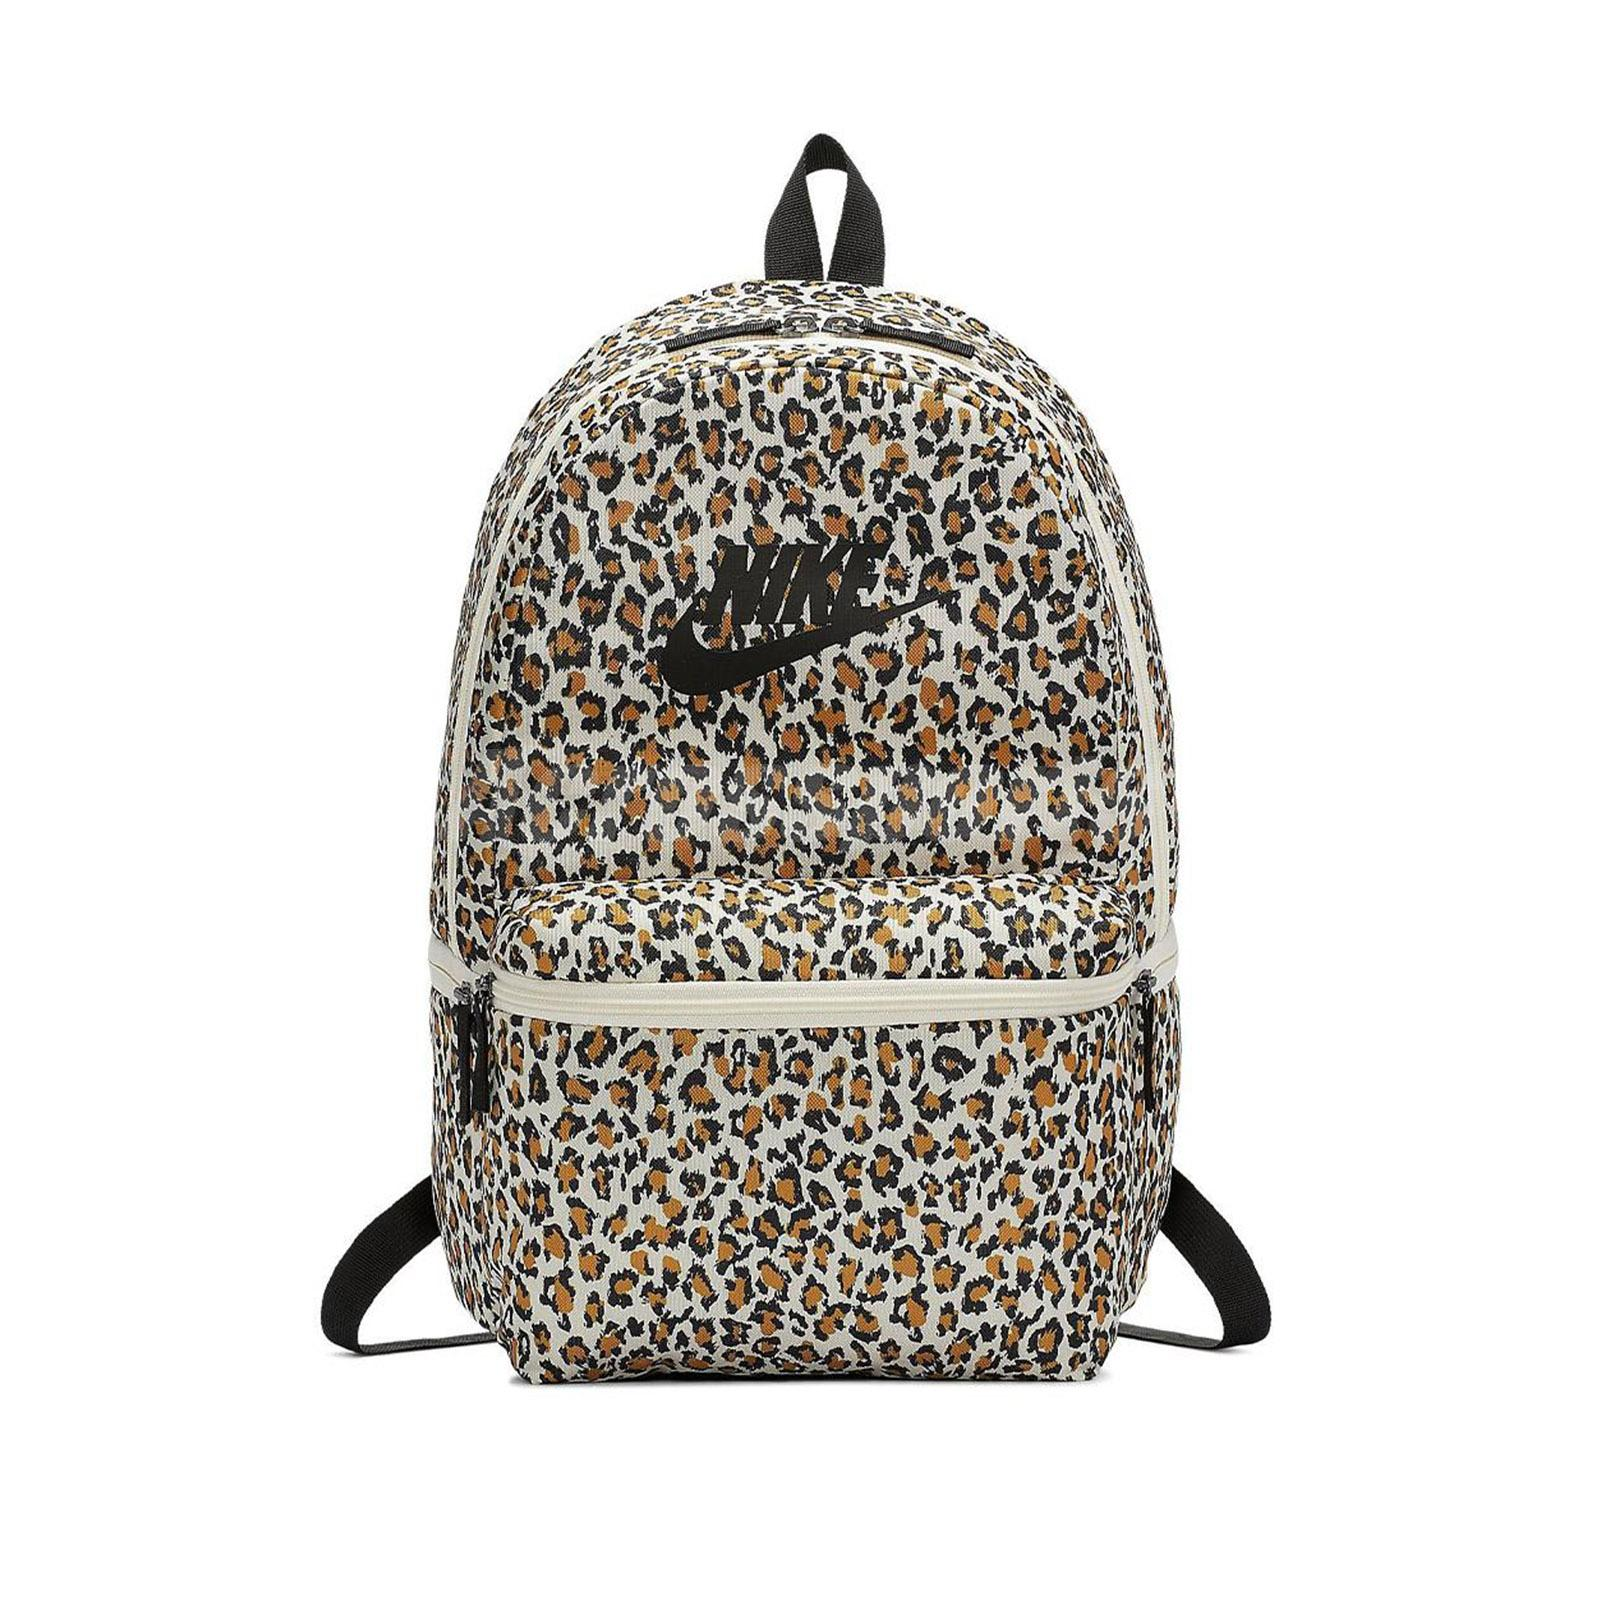 Details about Nike NSW Sportswear Heritage Leopard Print White Backpack Bag Bookbag BA5761 110